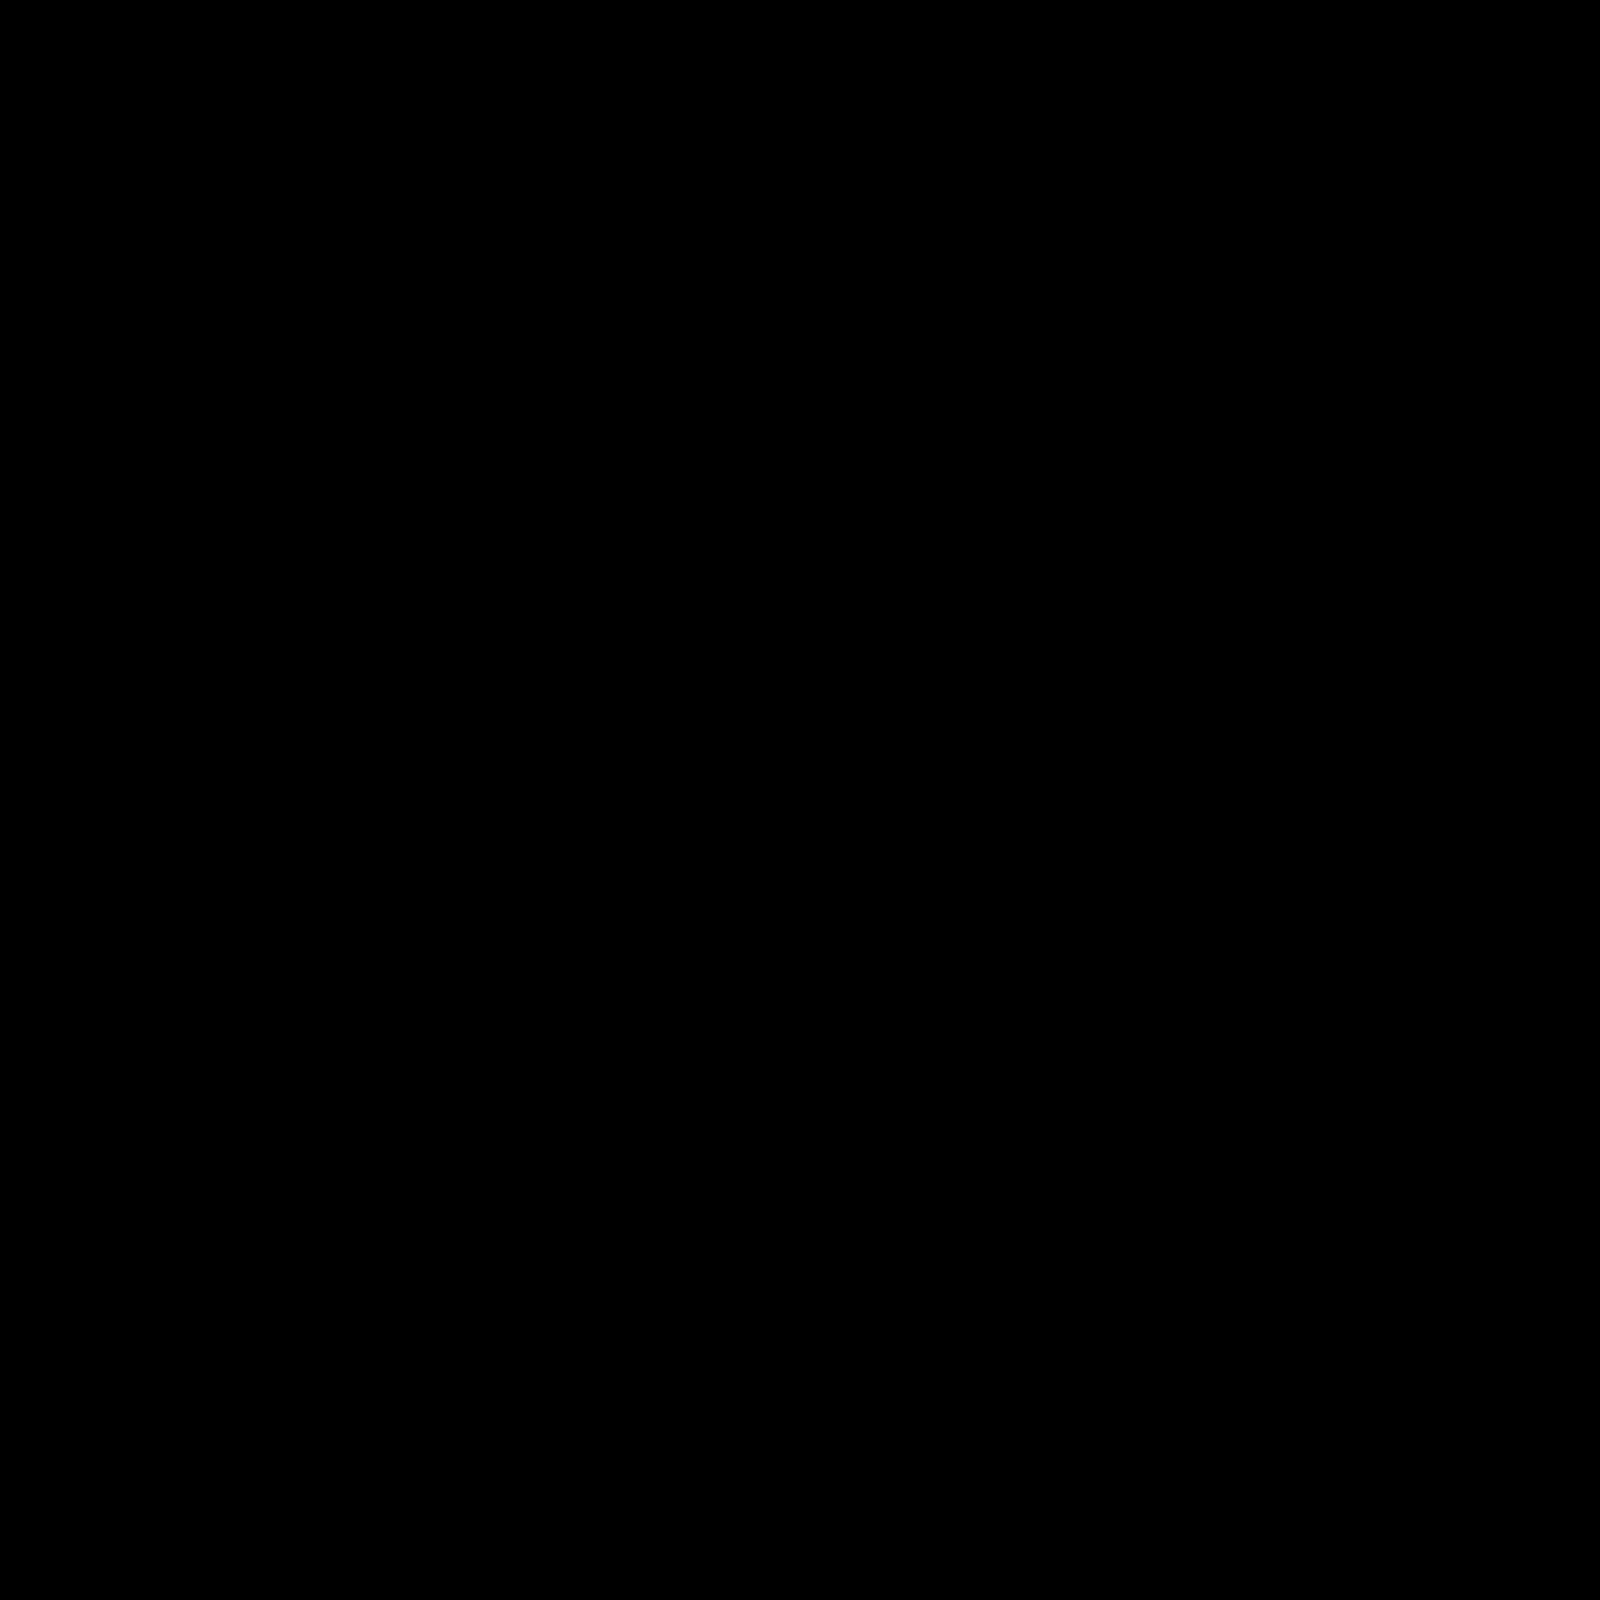 clipart download German Shepherd Silhouette Clip Art at GetDrawings